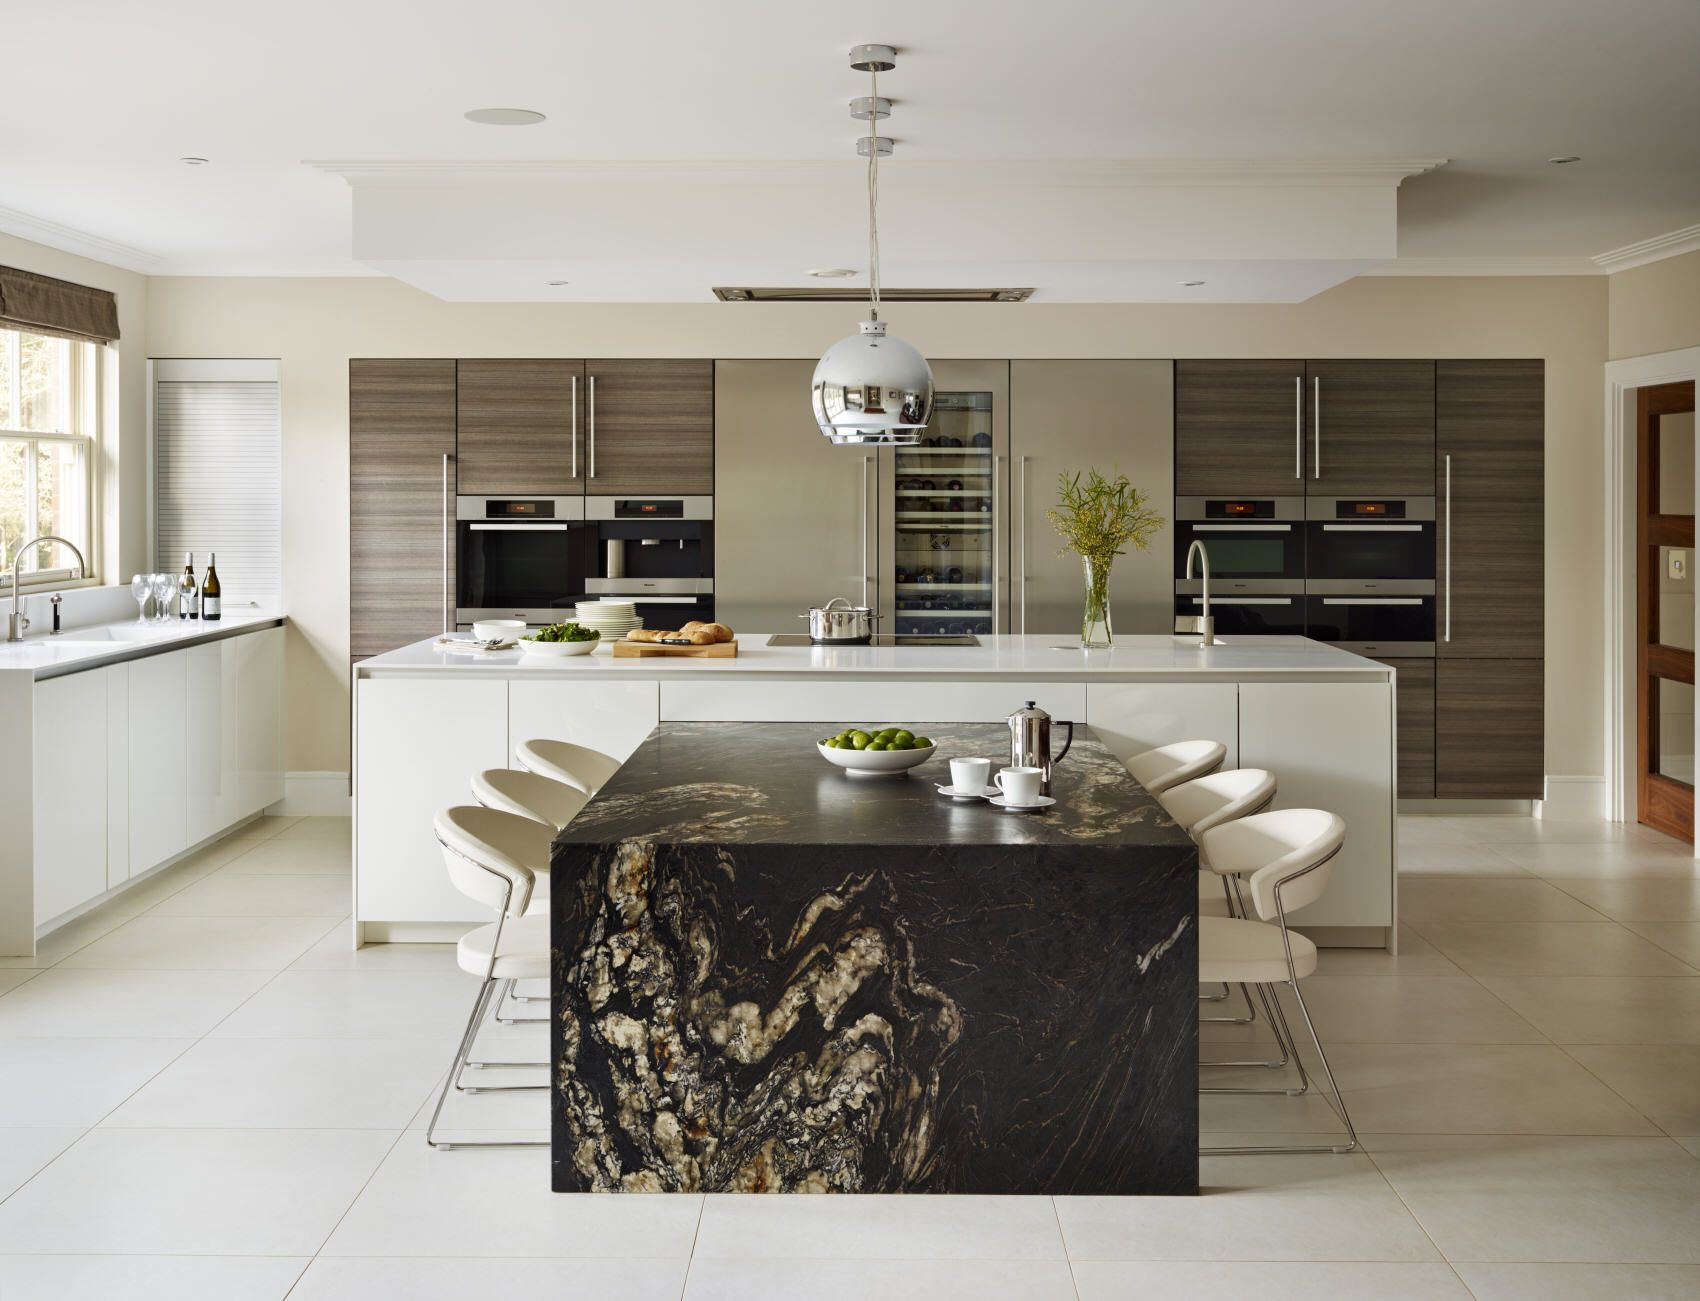 Luxury Designer Kitchens  Nicholas Anthony Mamamader2 I Pulled Impressive Designer Kitchen Inspiration